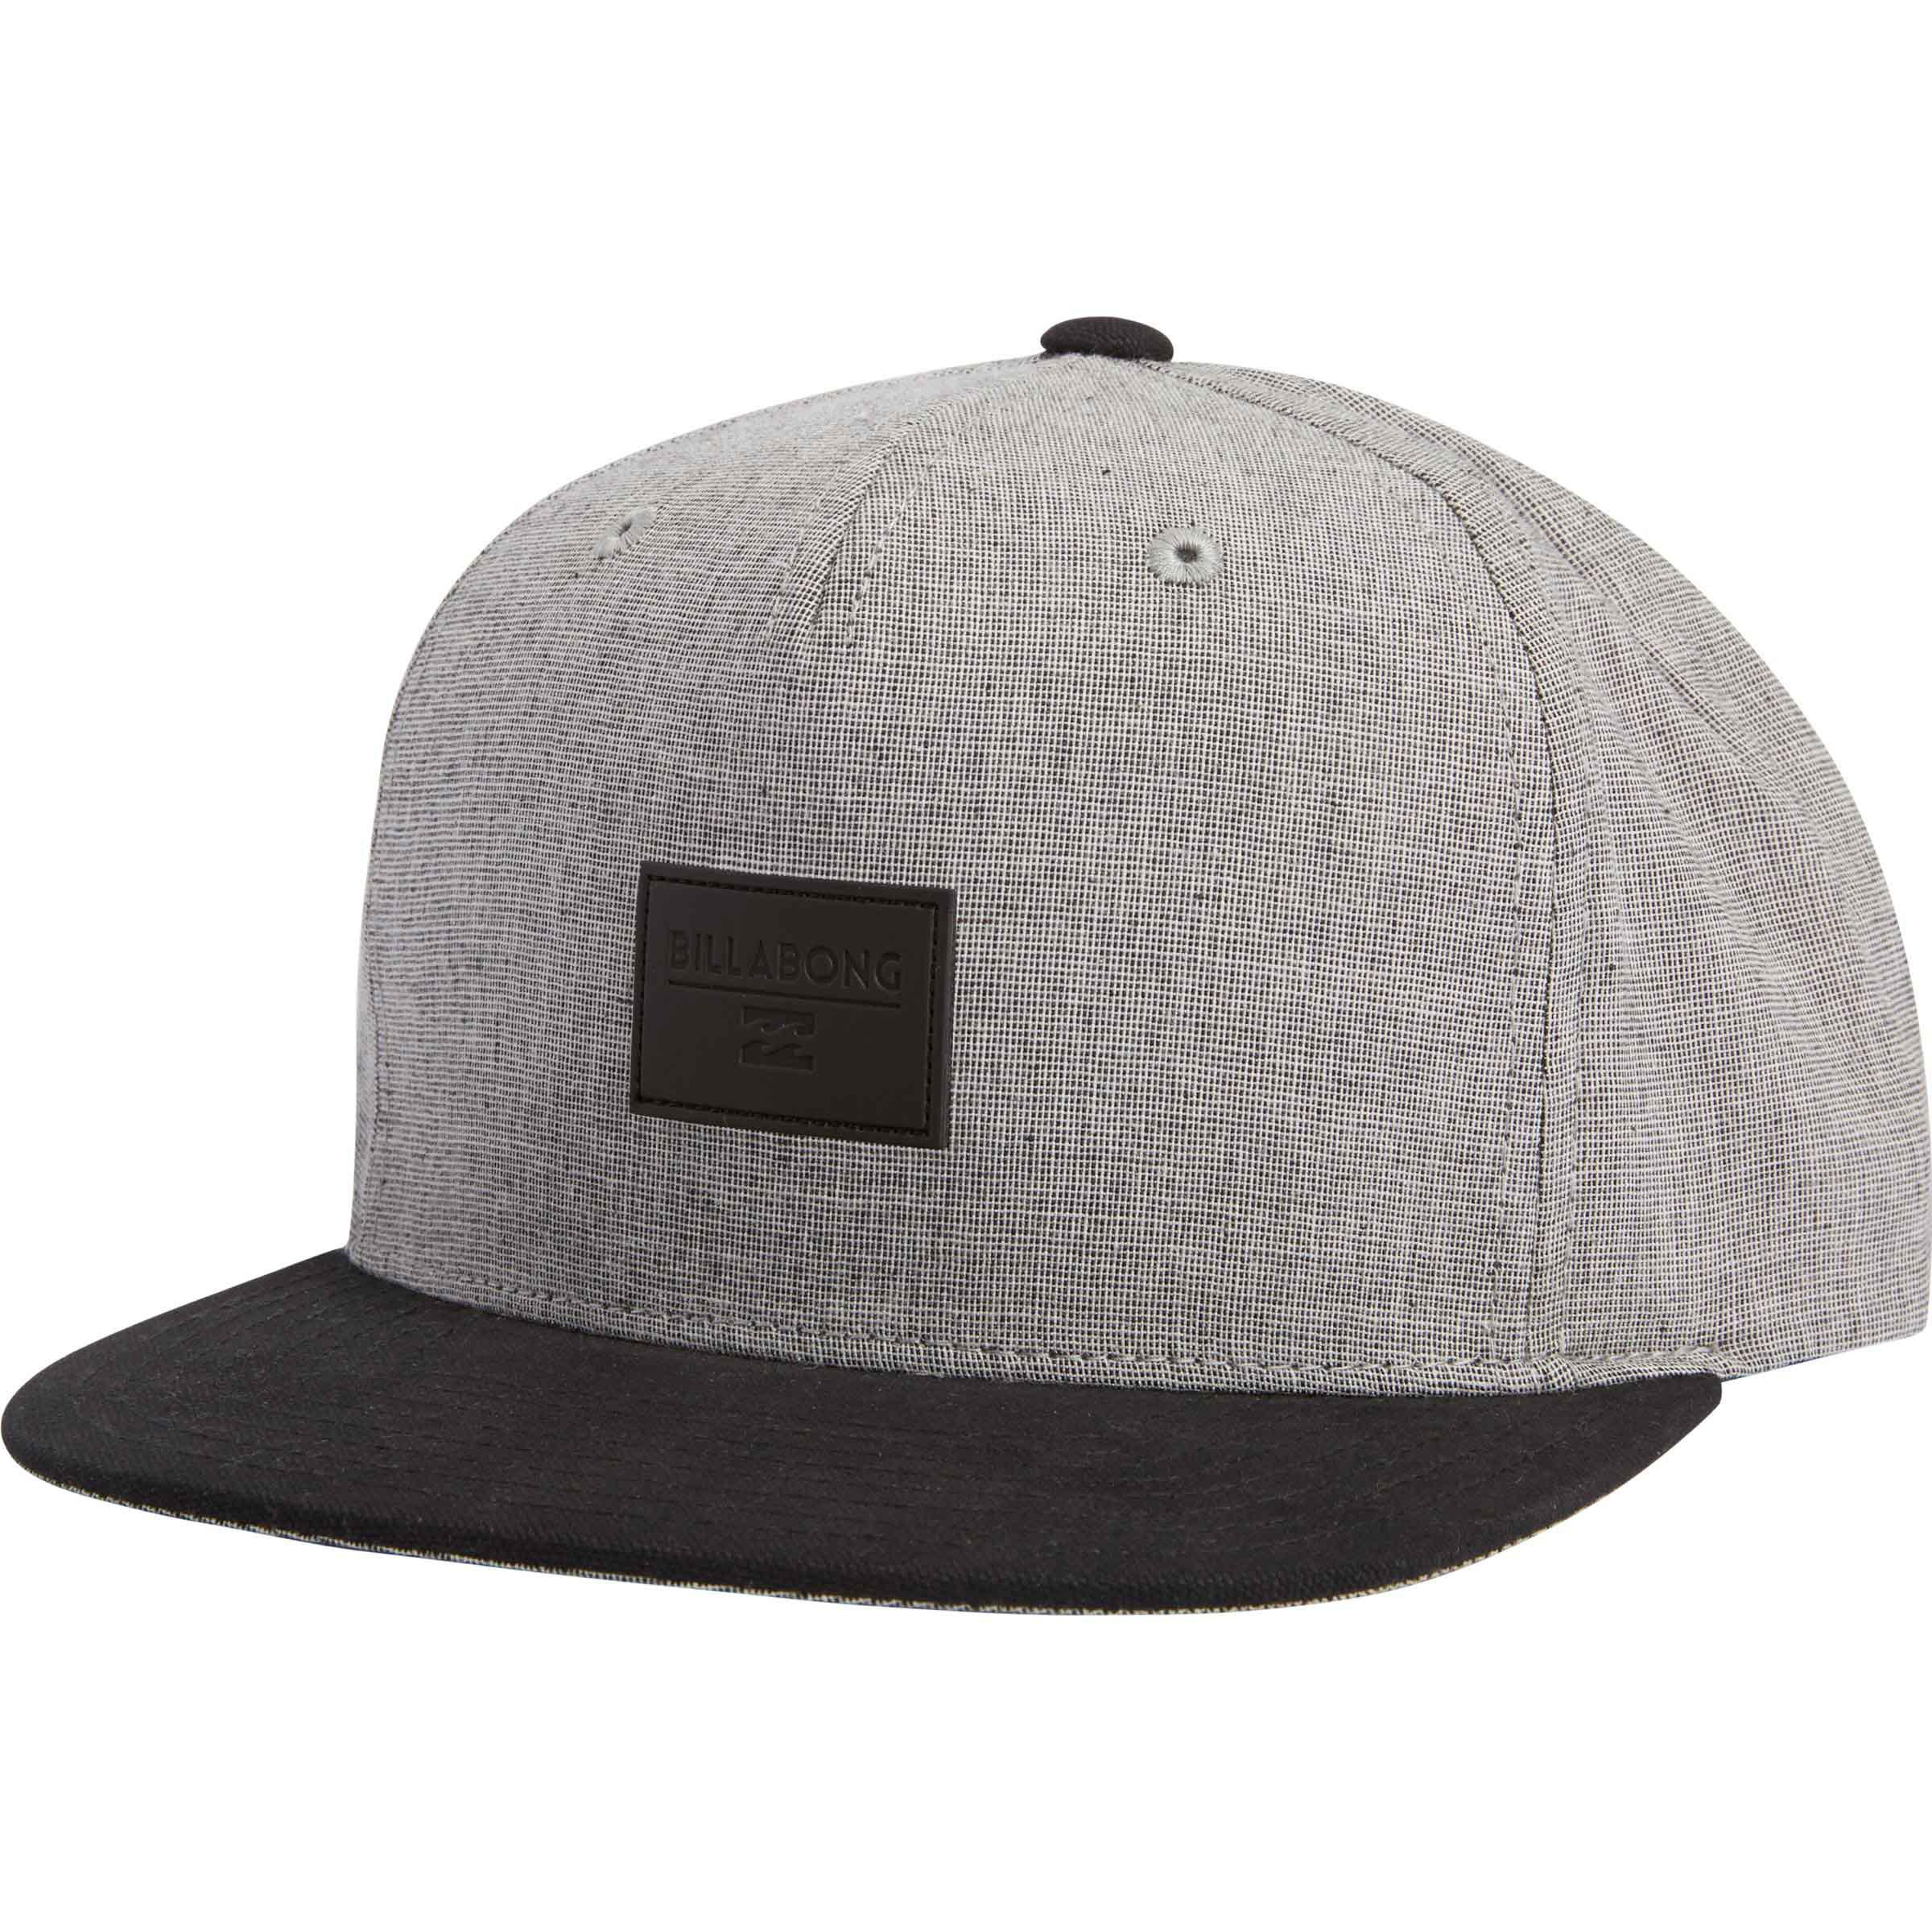 730f09d71 Lyst - Billabong Oxford Snapback in Gray for Men